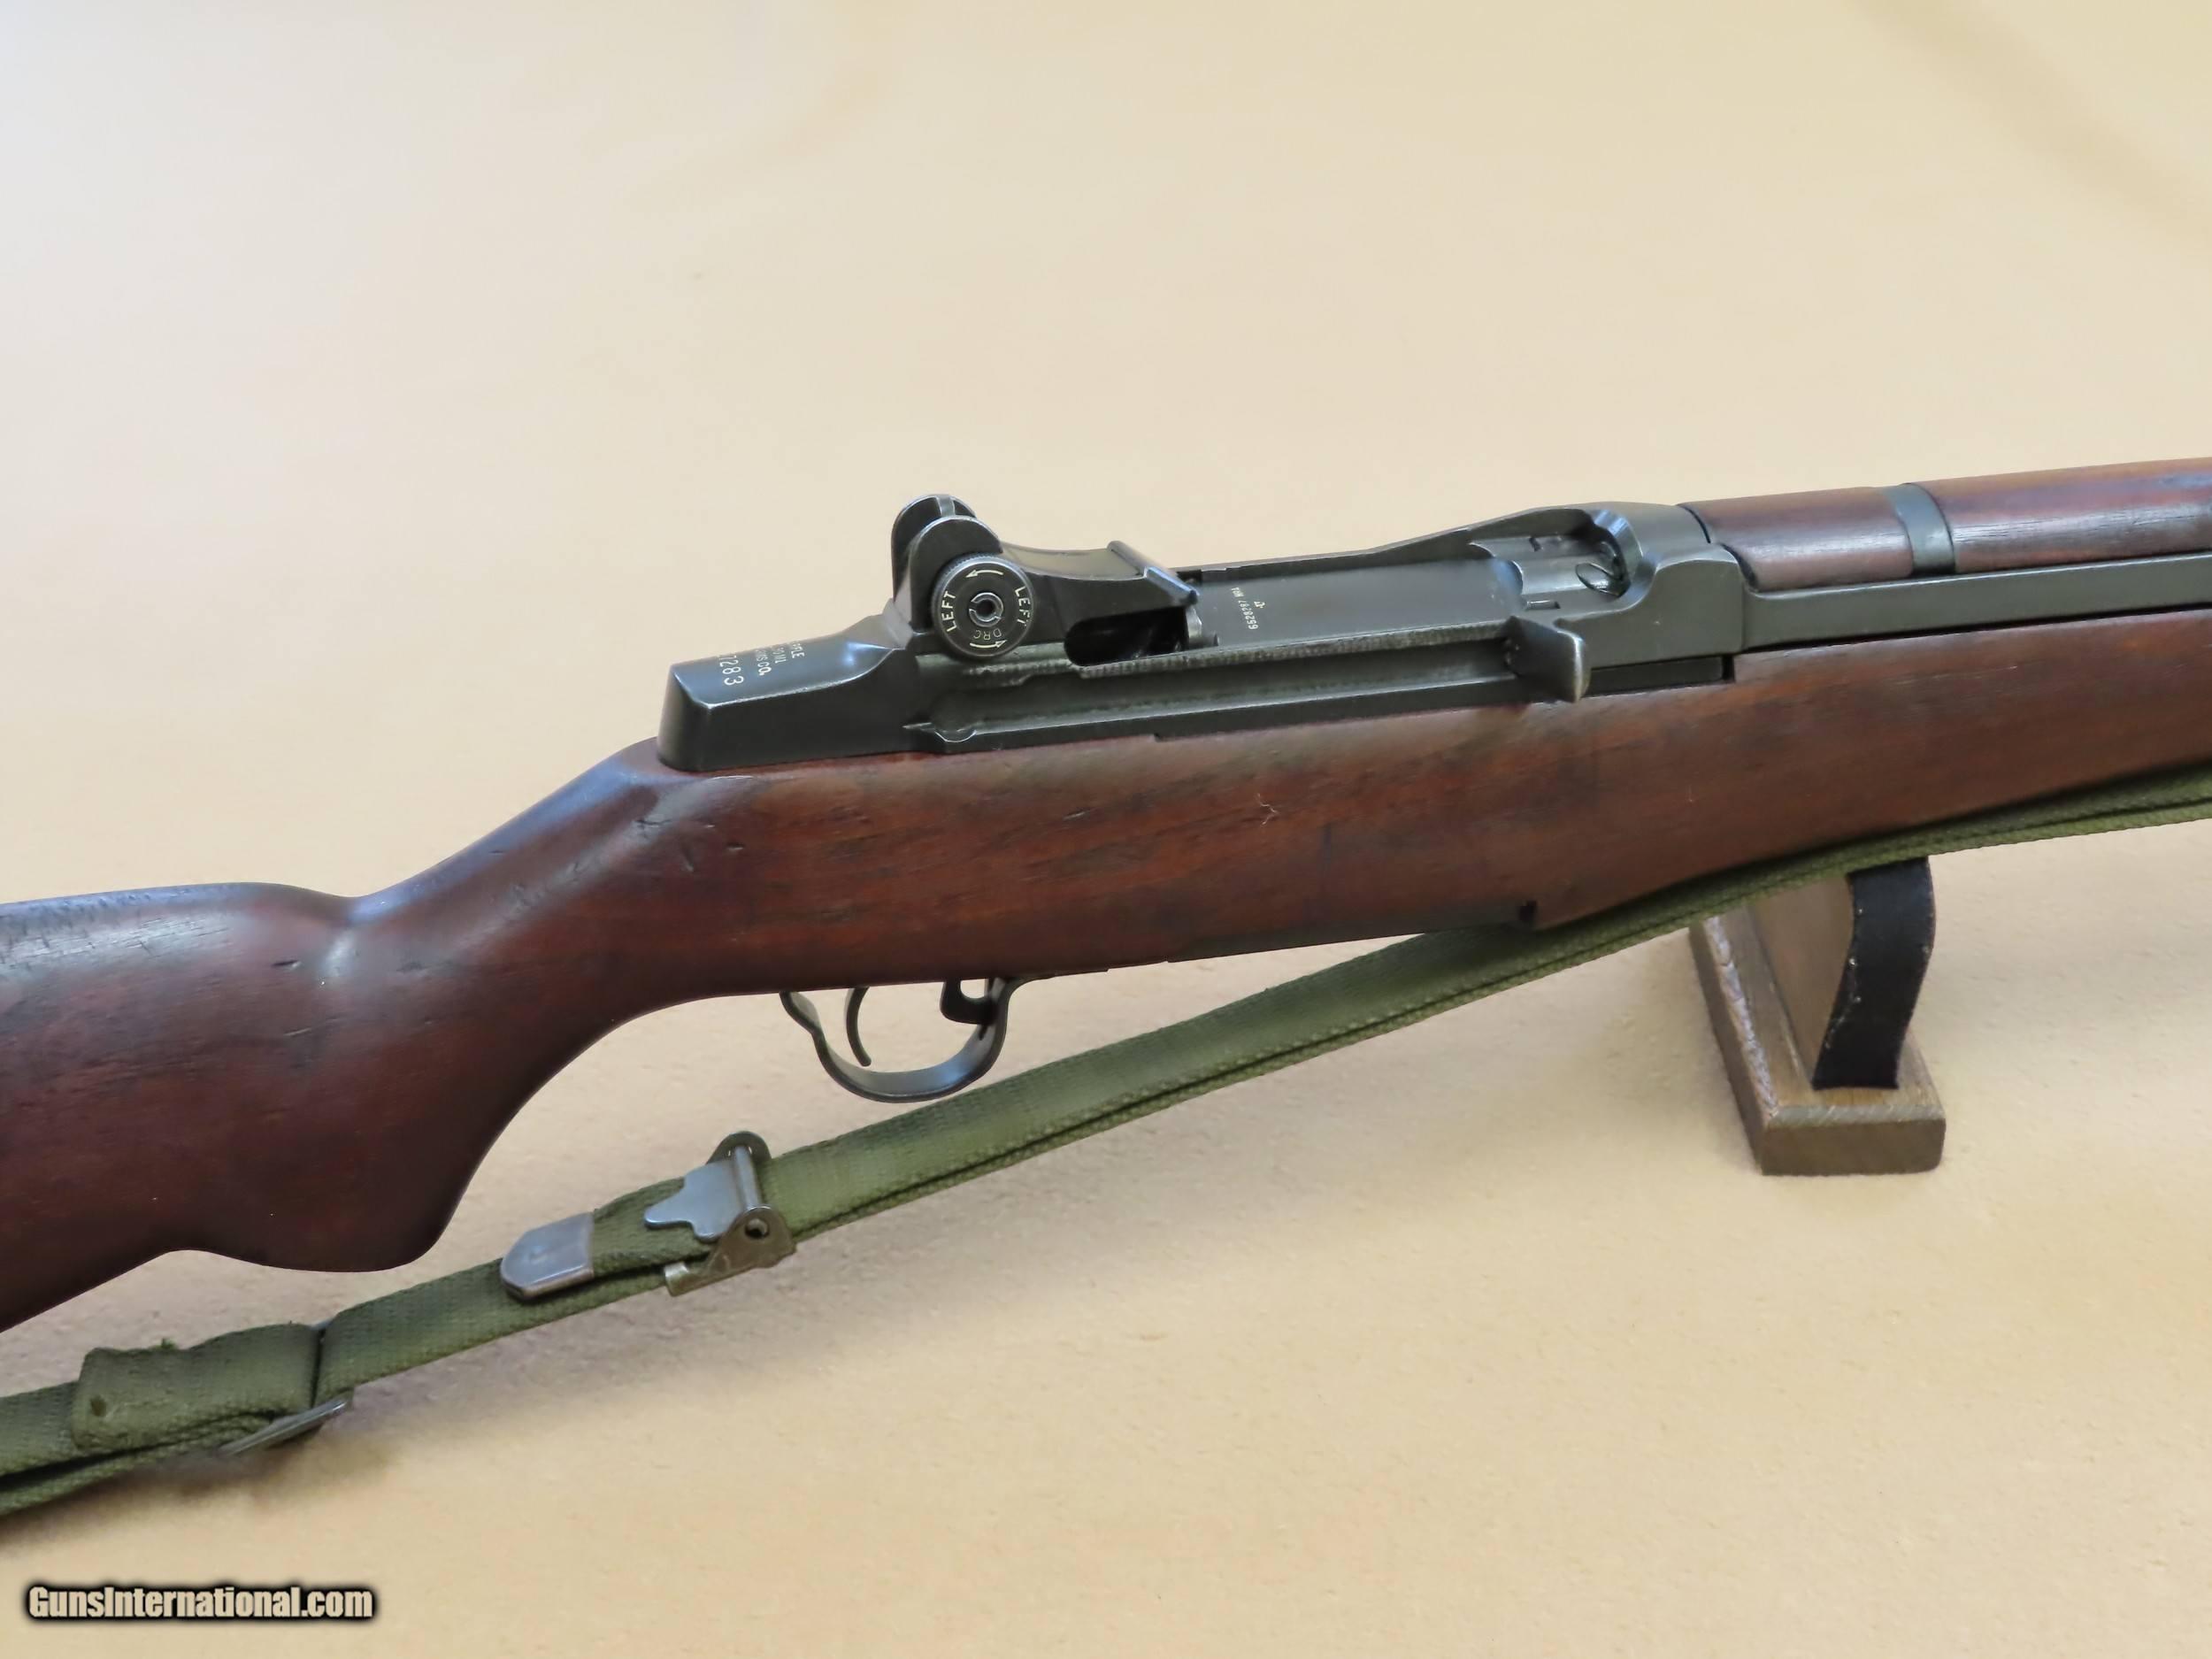 dating Springfield M1 Garand